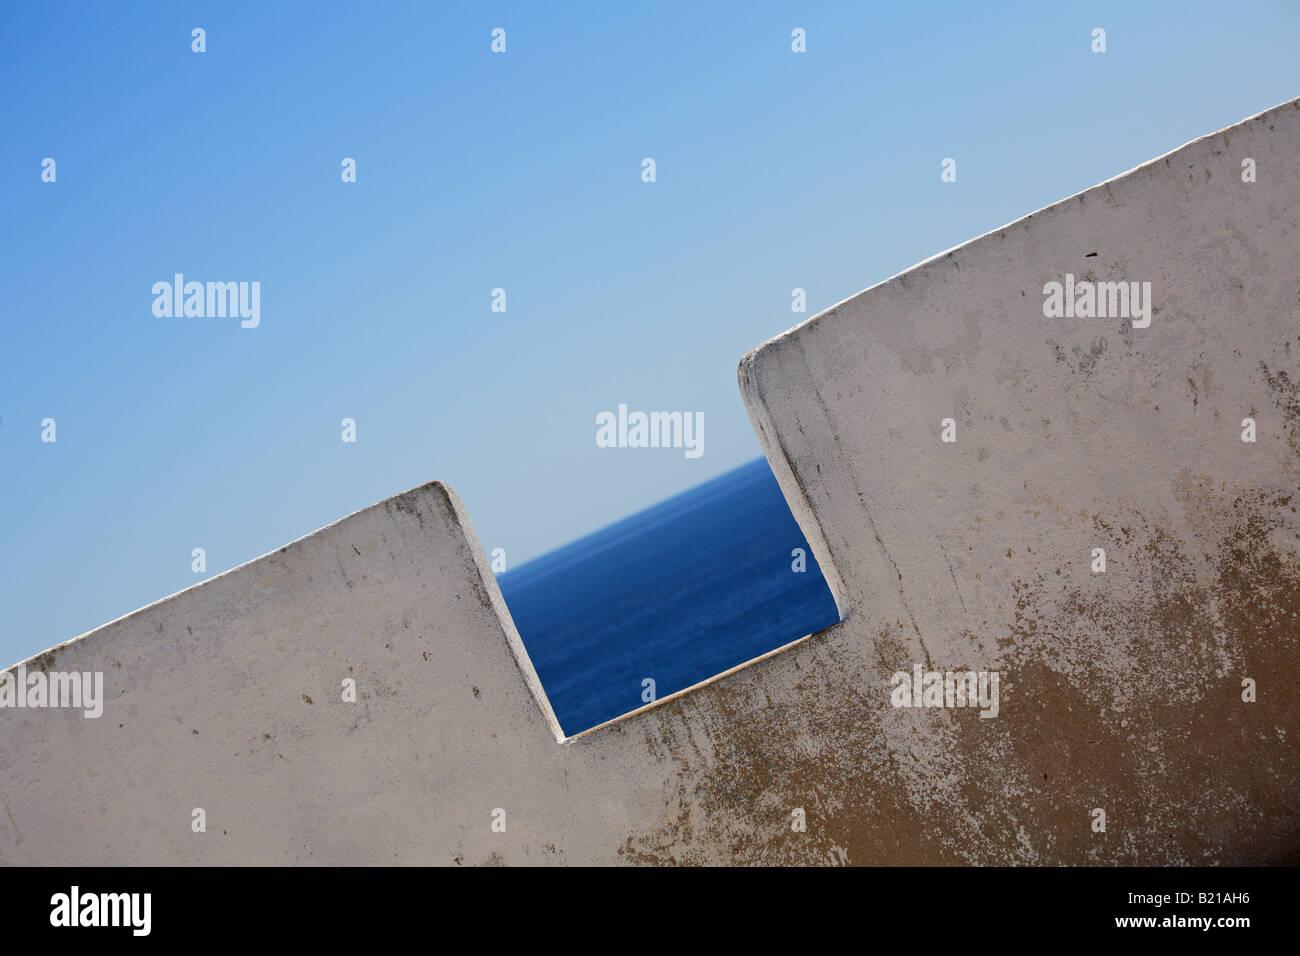 A white wall at Fortaleza de Sagres, Sagres, Algarve, Portugal - Stock Image